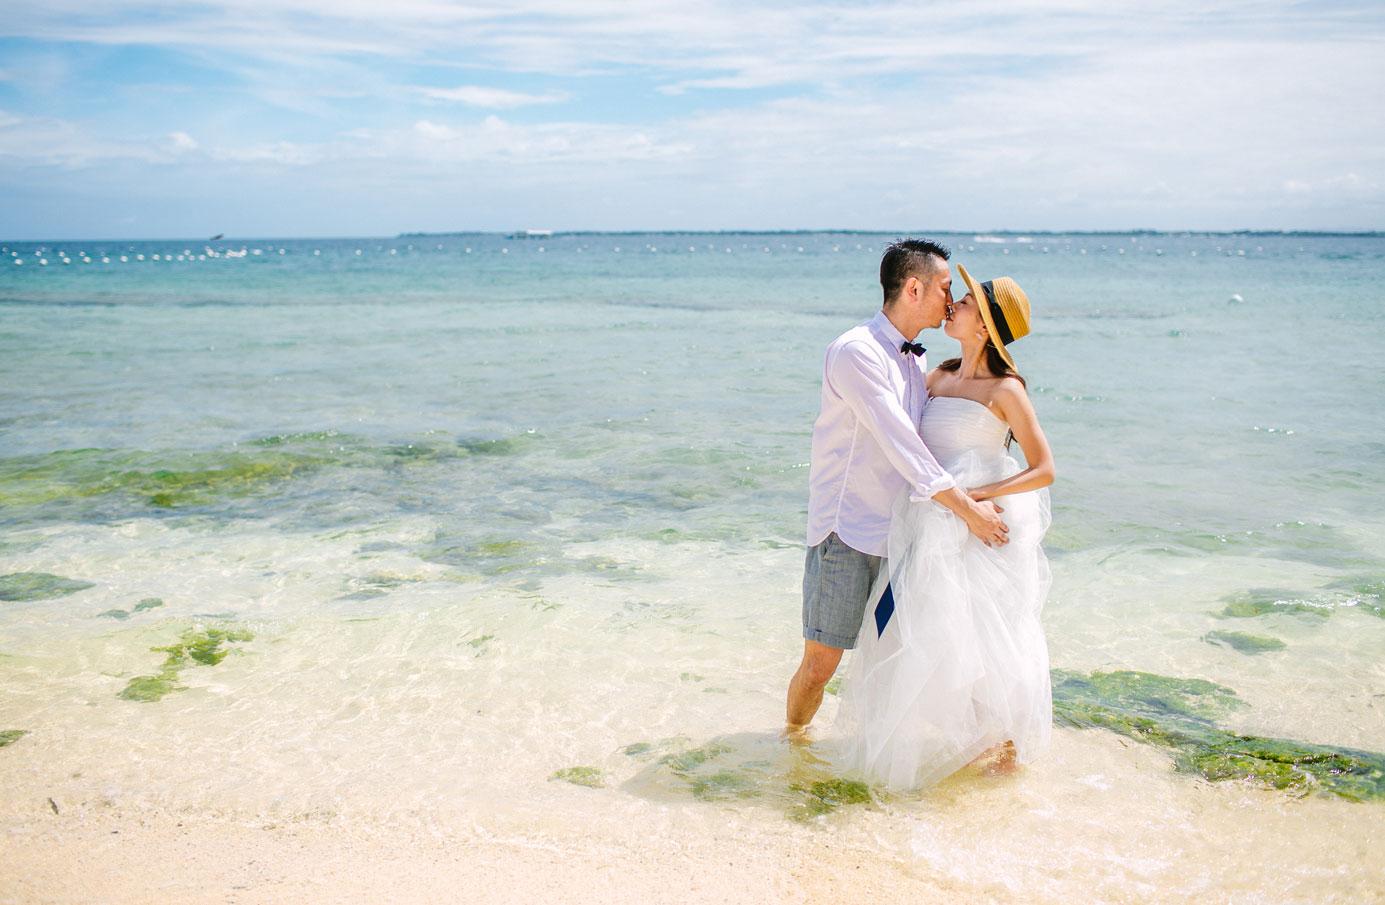 cebu-photo-wedding-crimson (2)